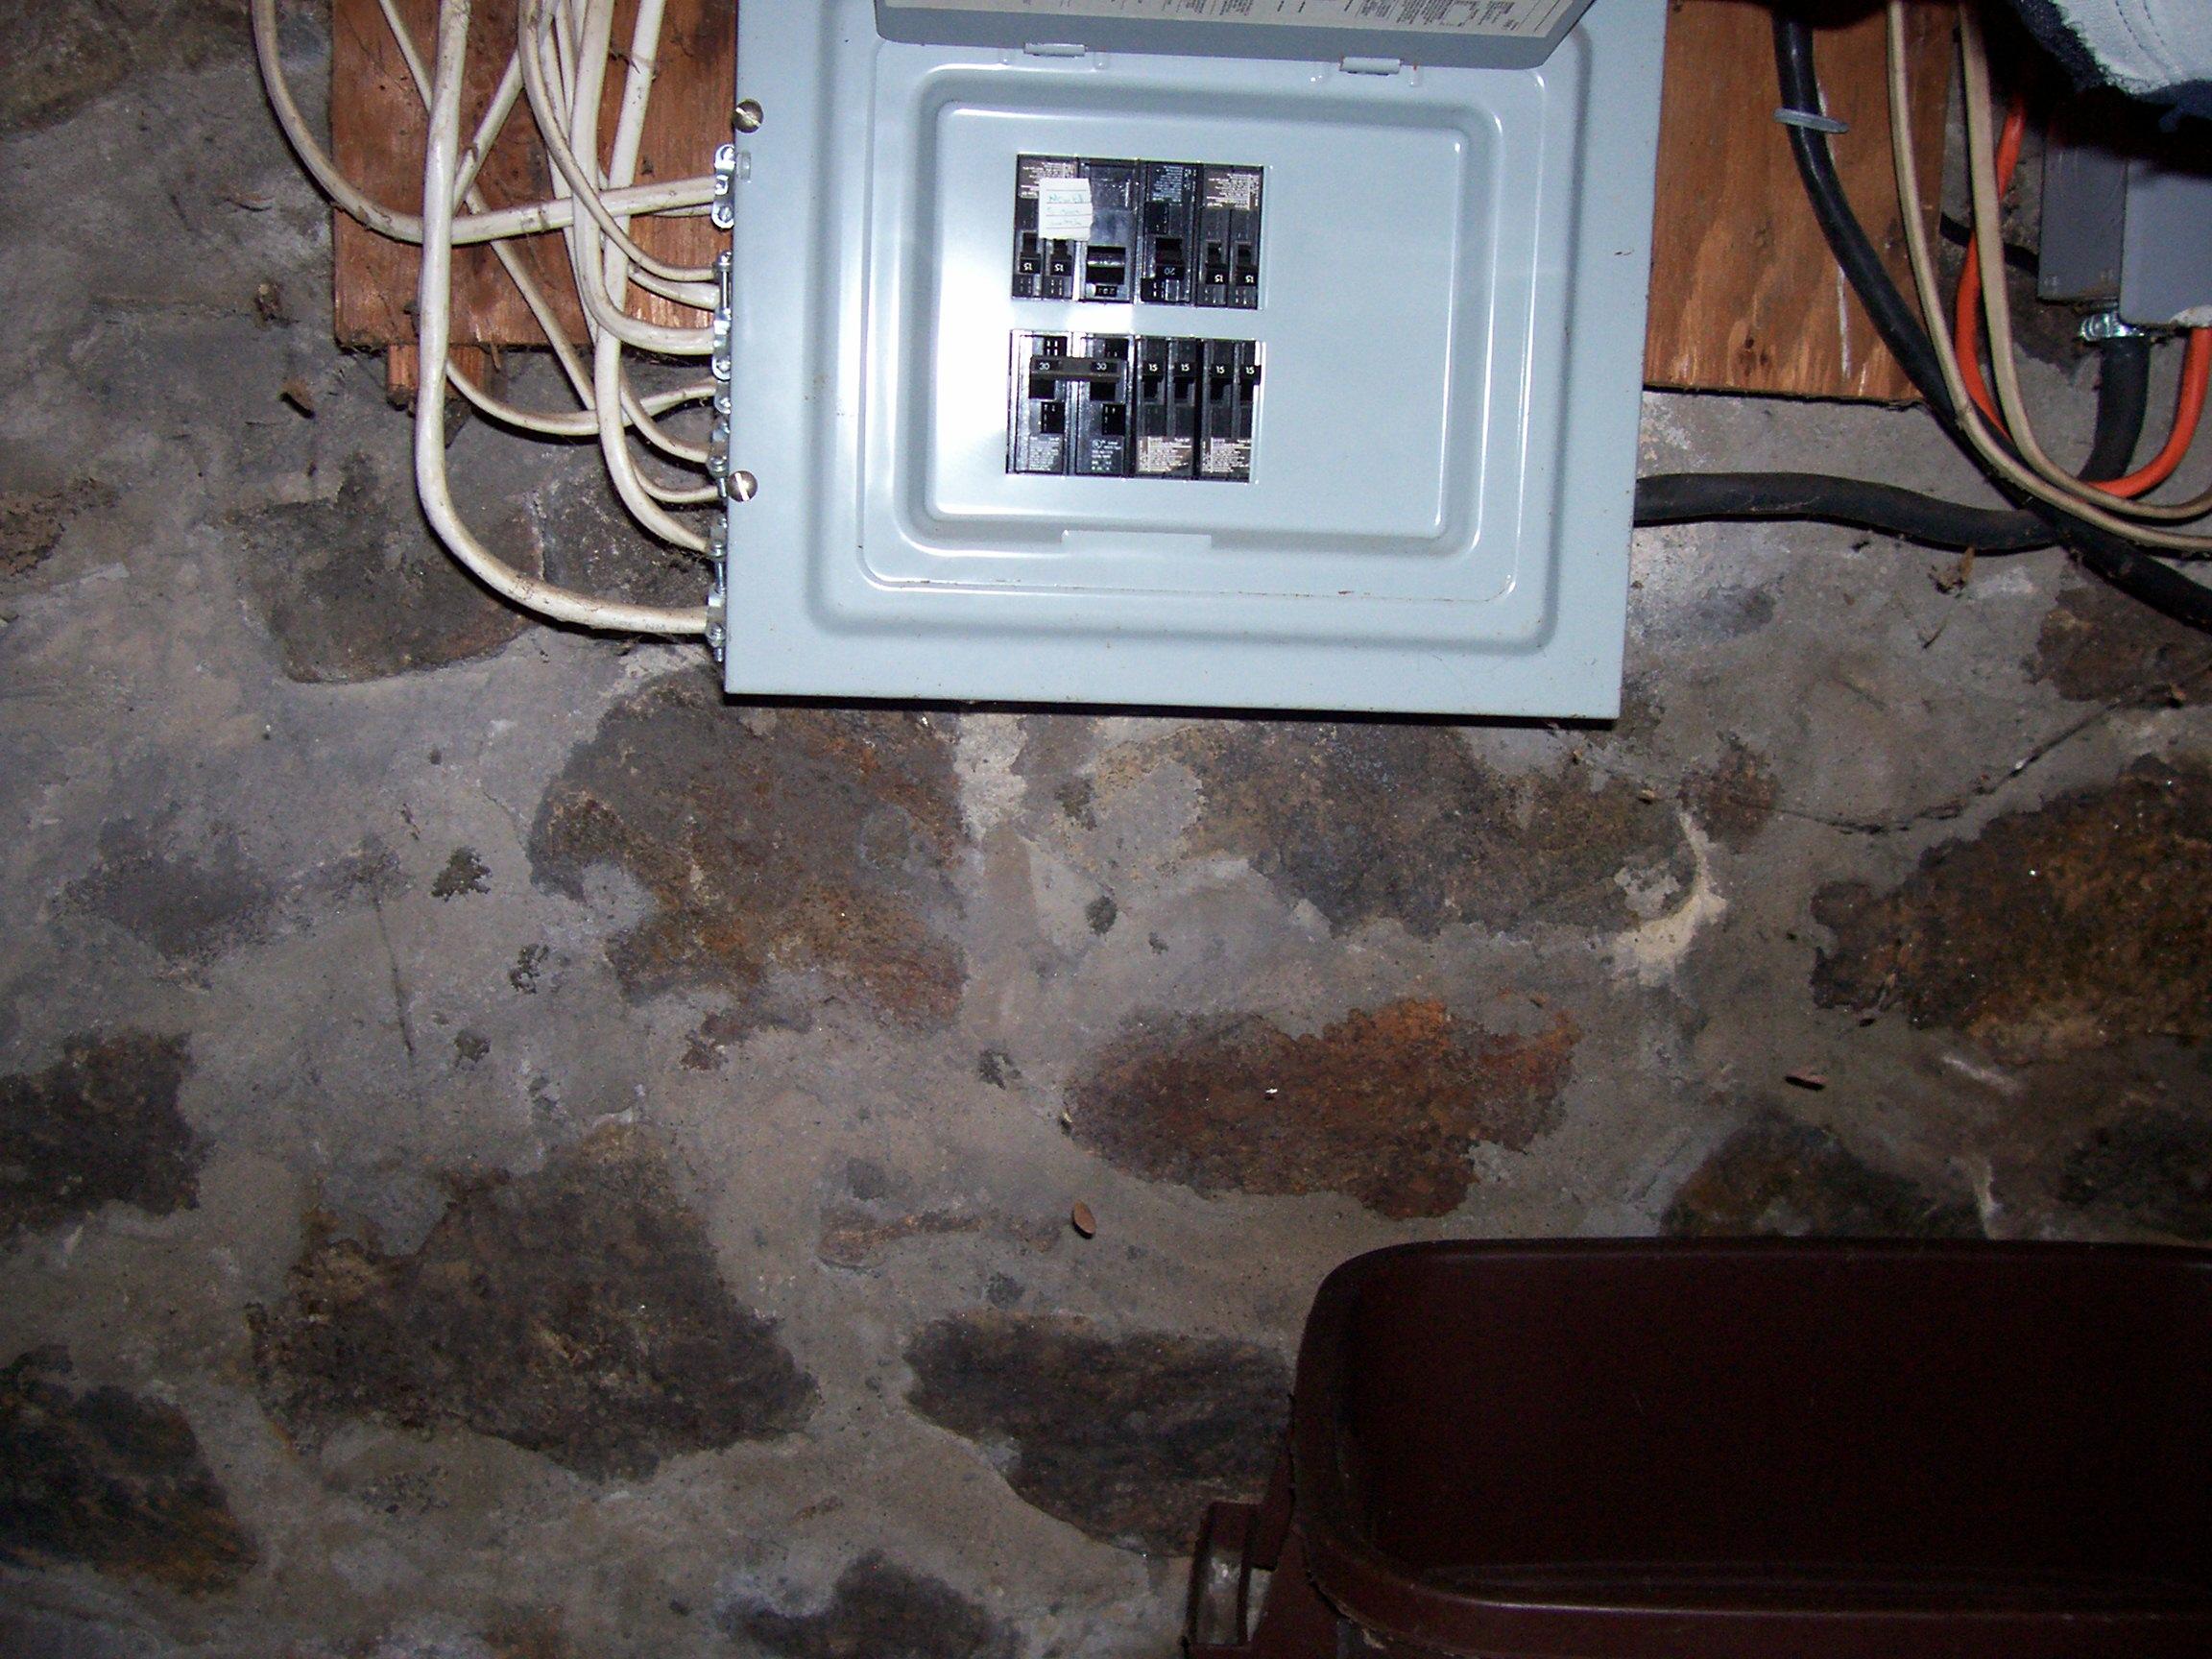 Zinsco Panel Replacement Fuse Box